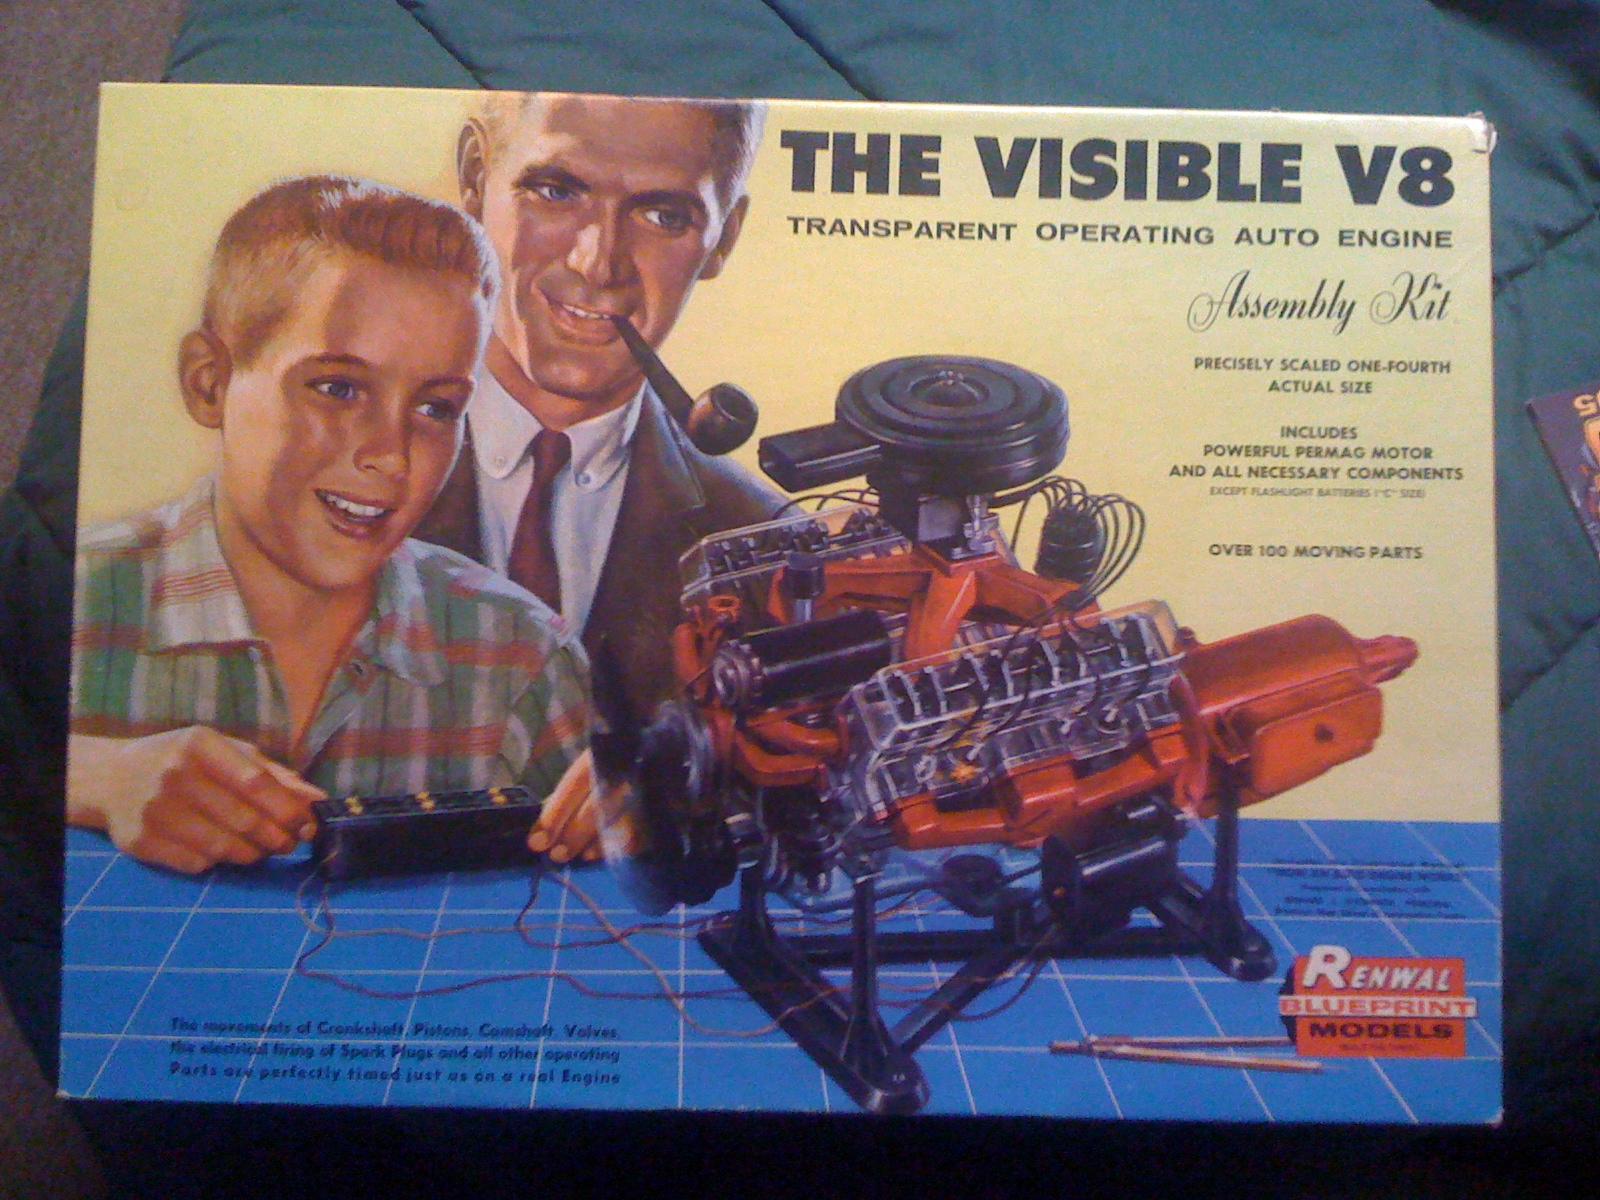 The Visible V8